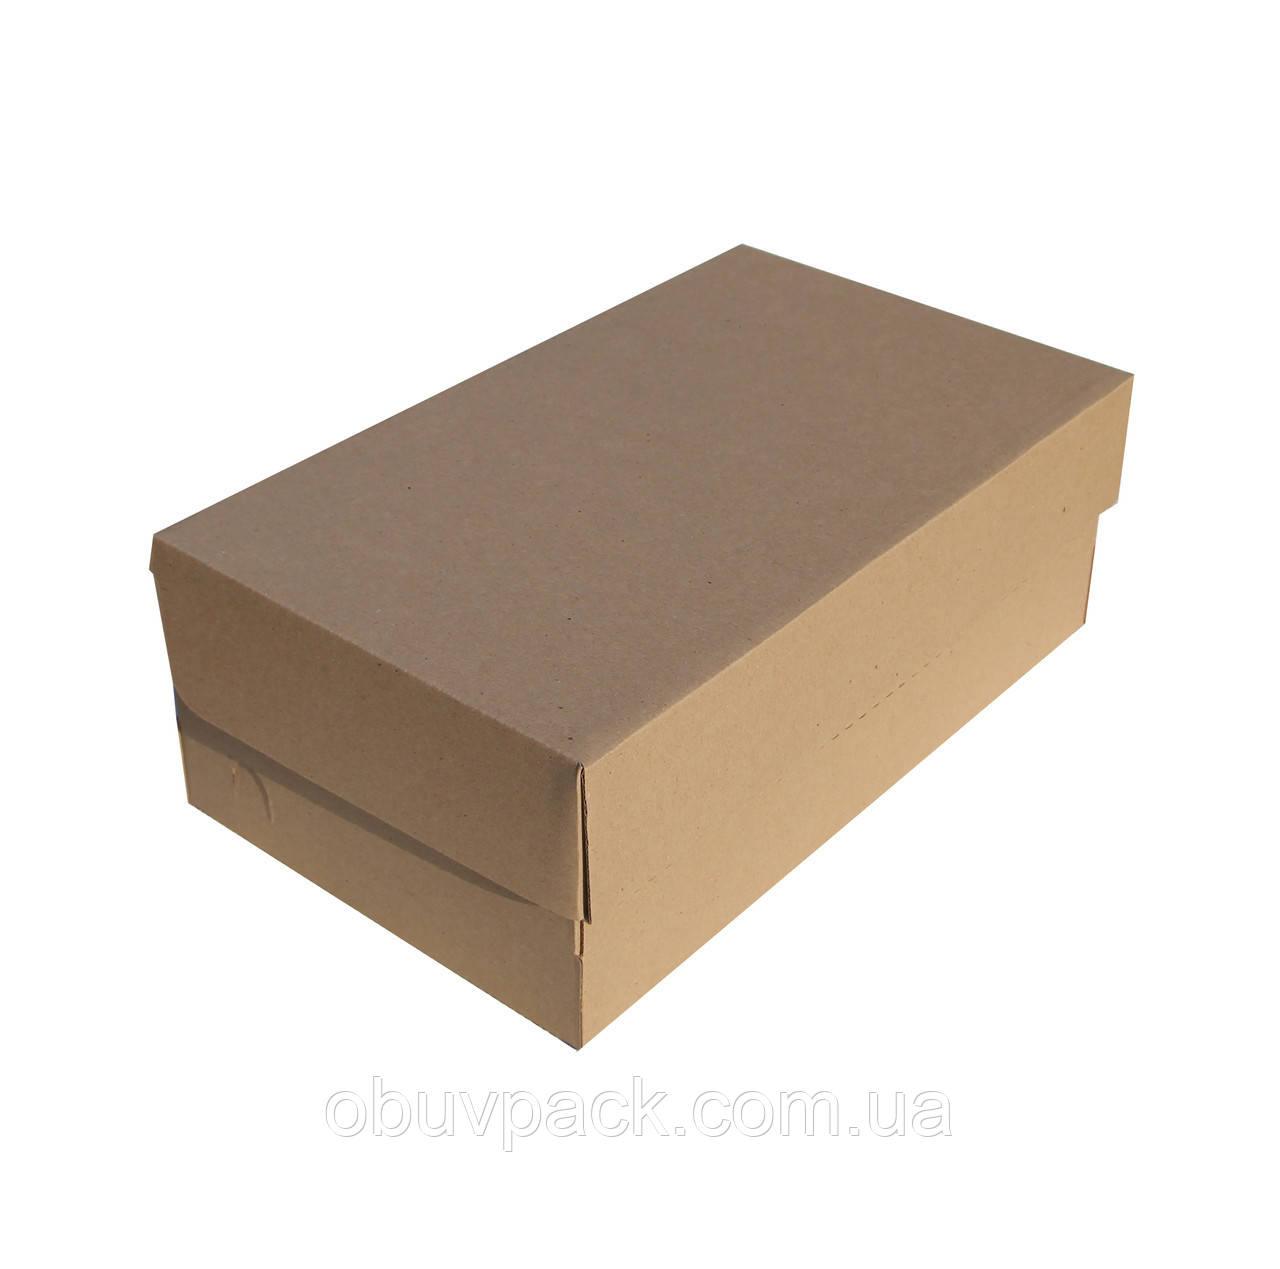 Коробка обувная 340х200х120 мужской туфель бурая